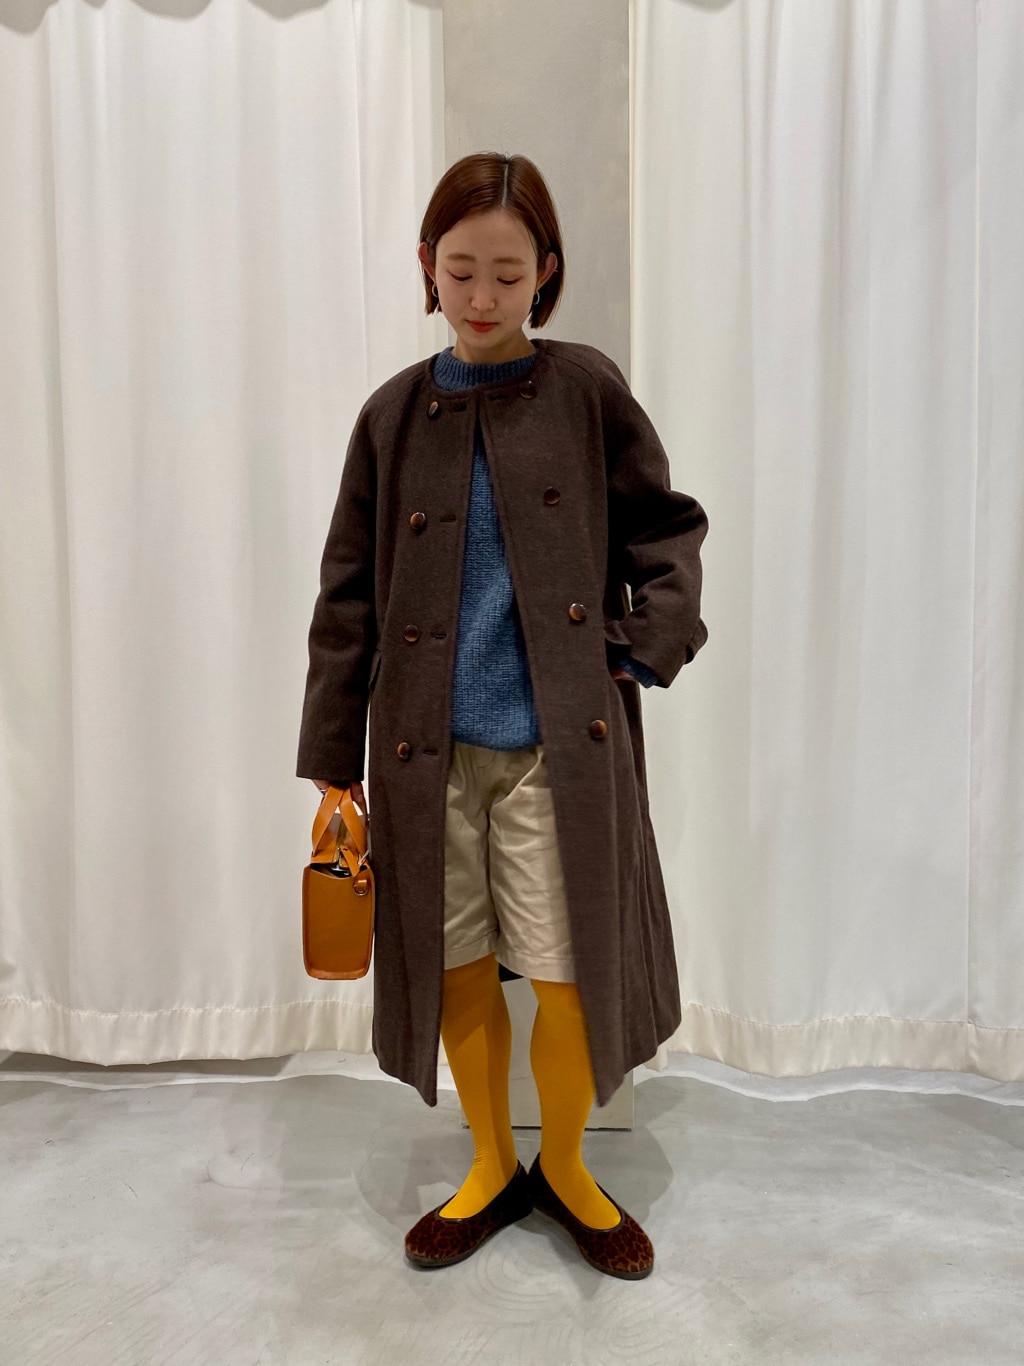 CHILD WOMAN , PAR ICI 東京スカイツリータウン・ソラマチ 2020.11.27